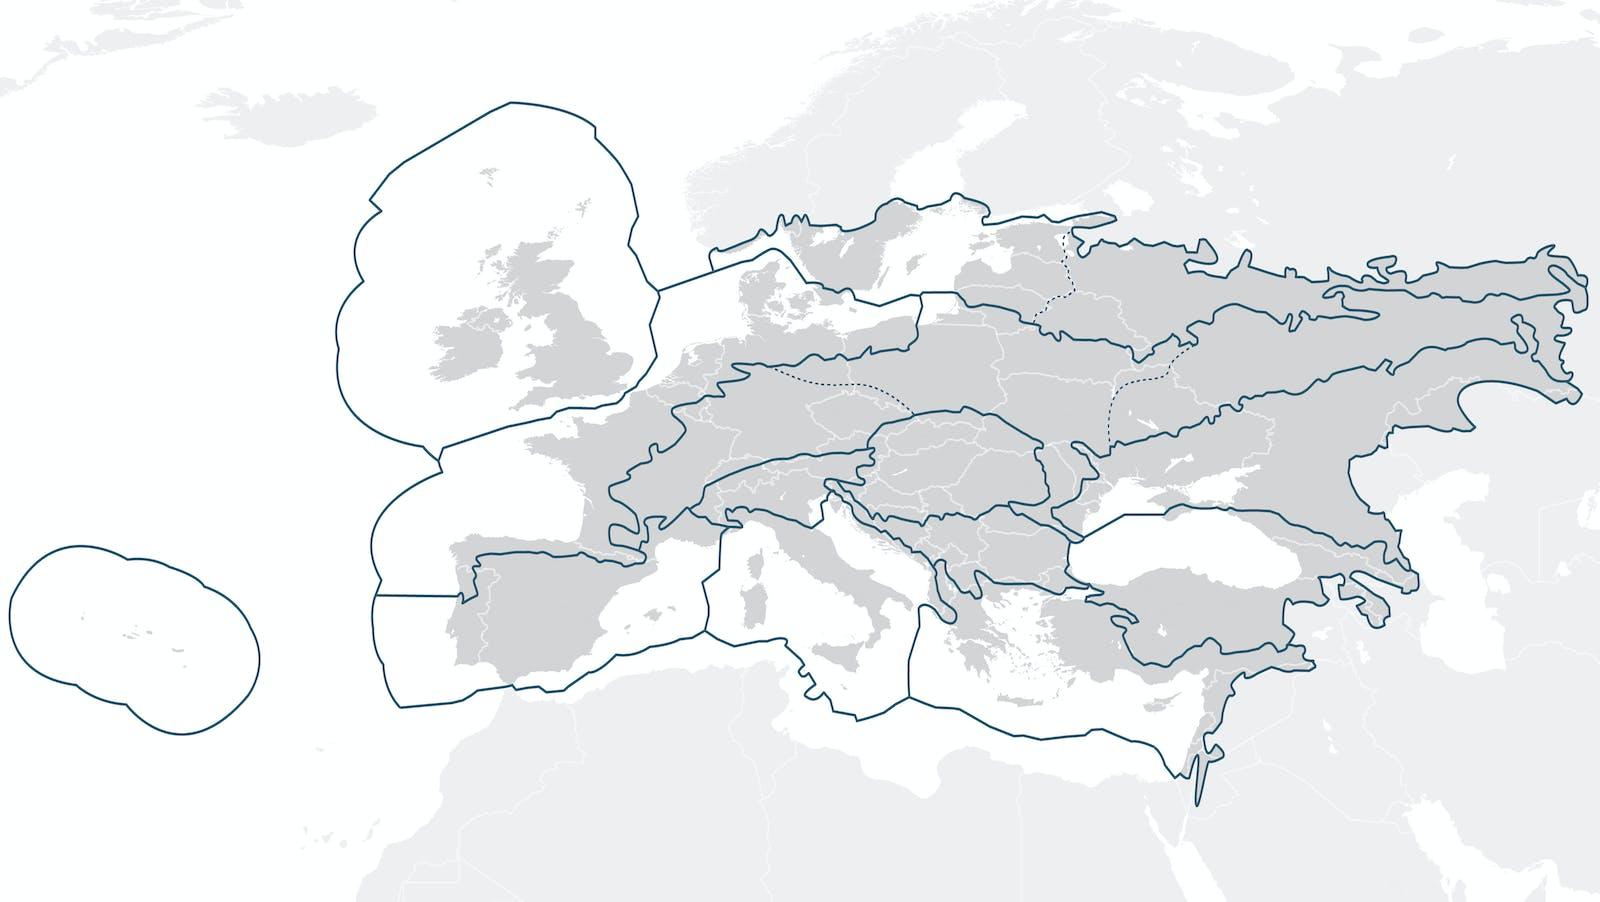 Western Eurasia